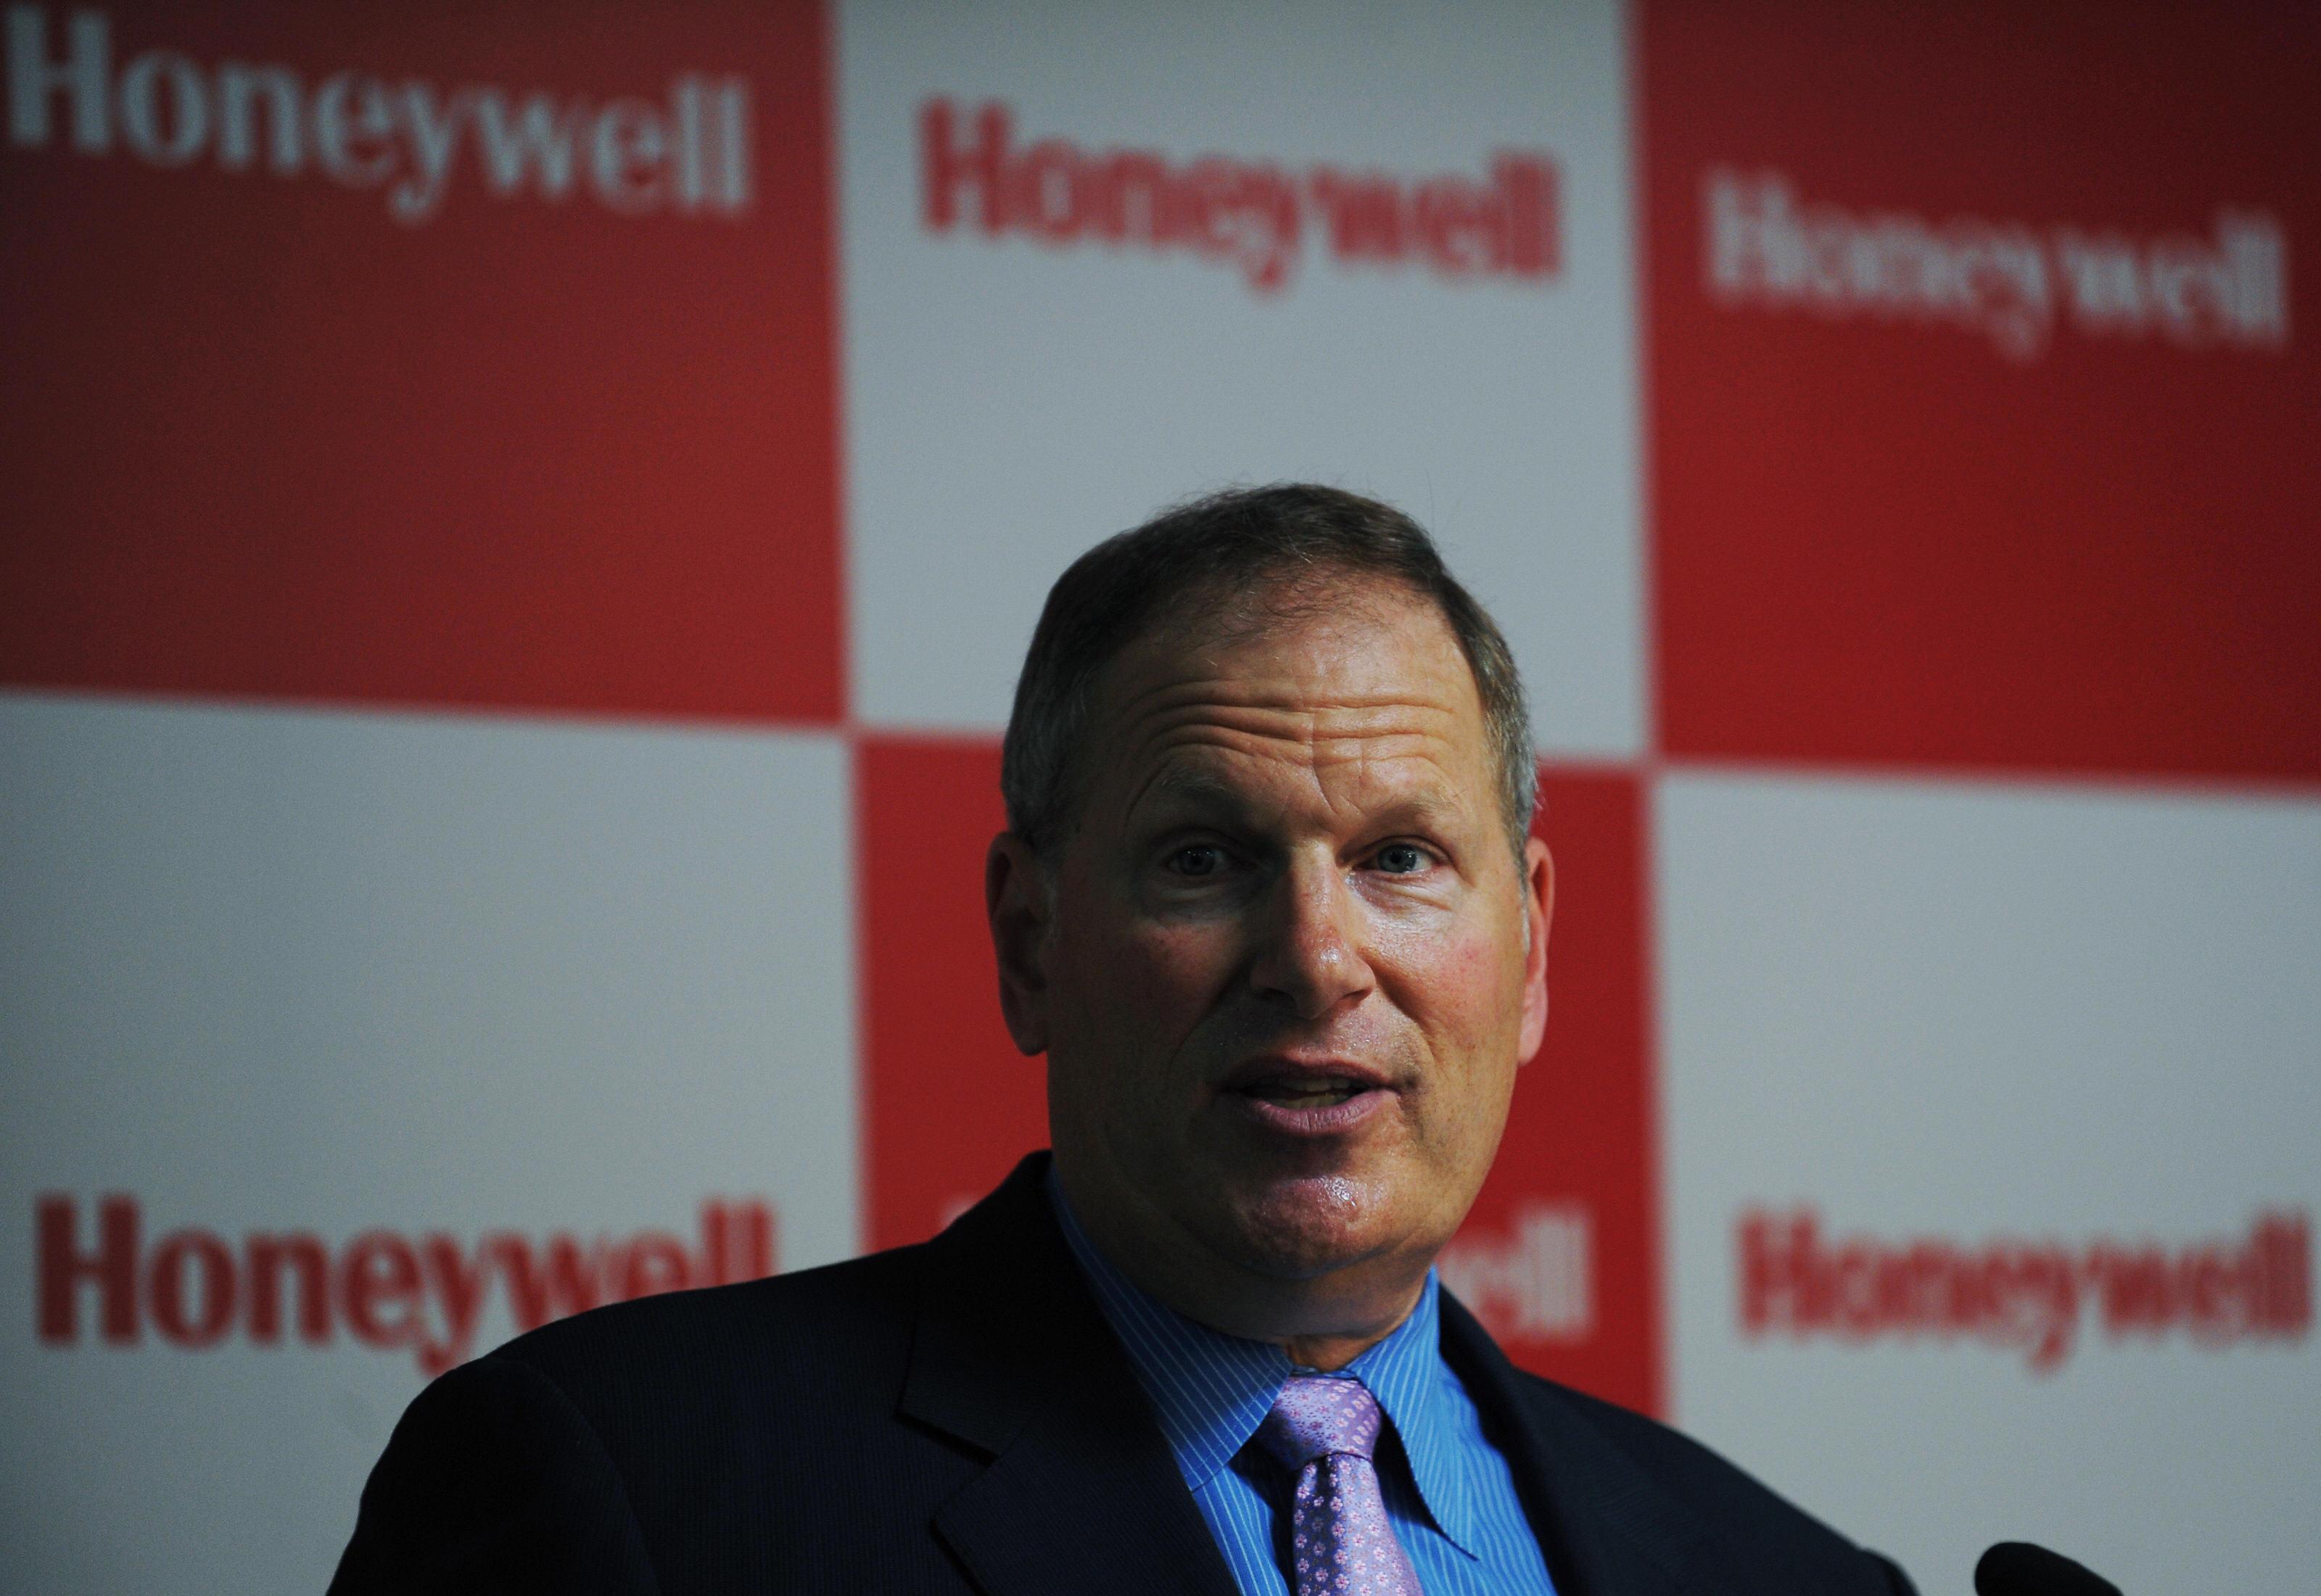 Honeywell Goes Public With UTC Overtures